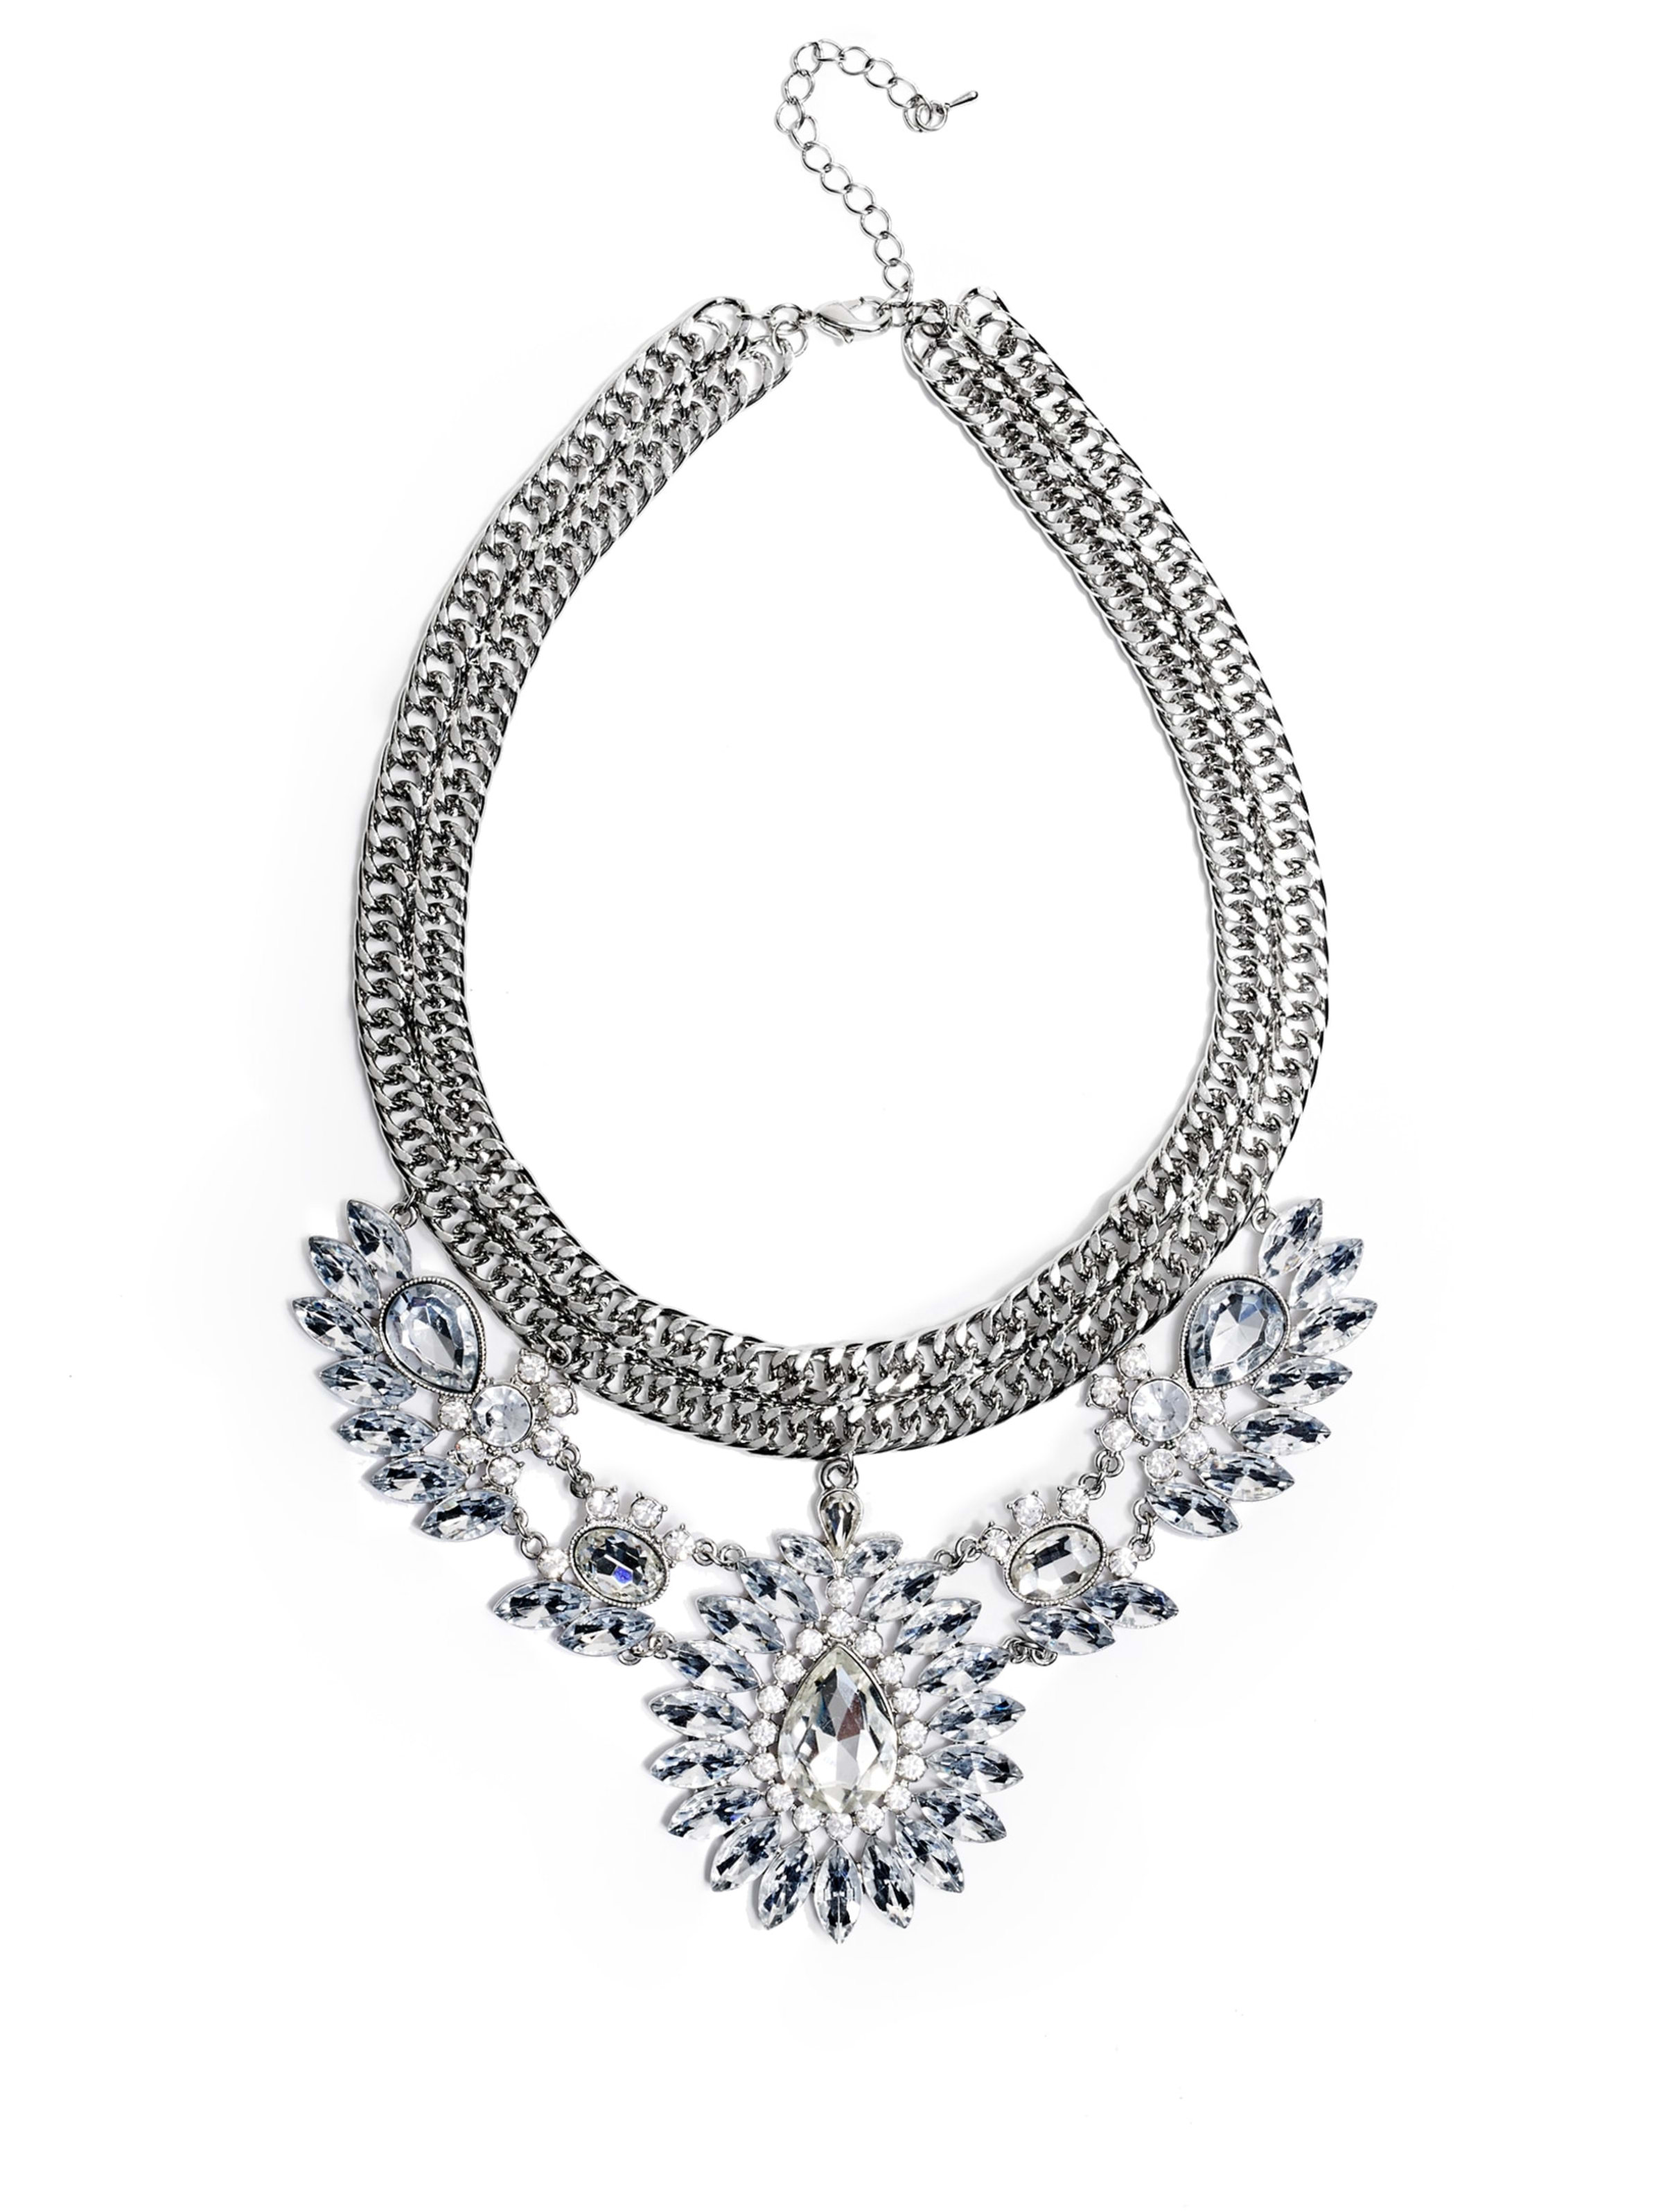 Alexis Silver alexis silver-tone stone necklace | guess.ca